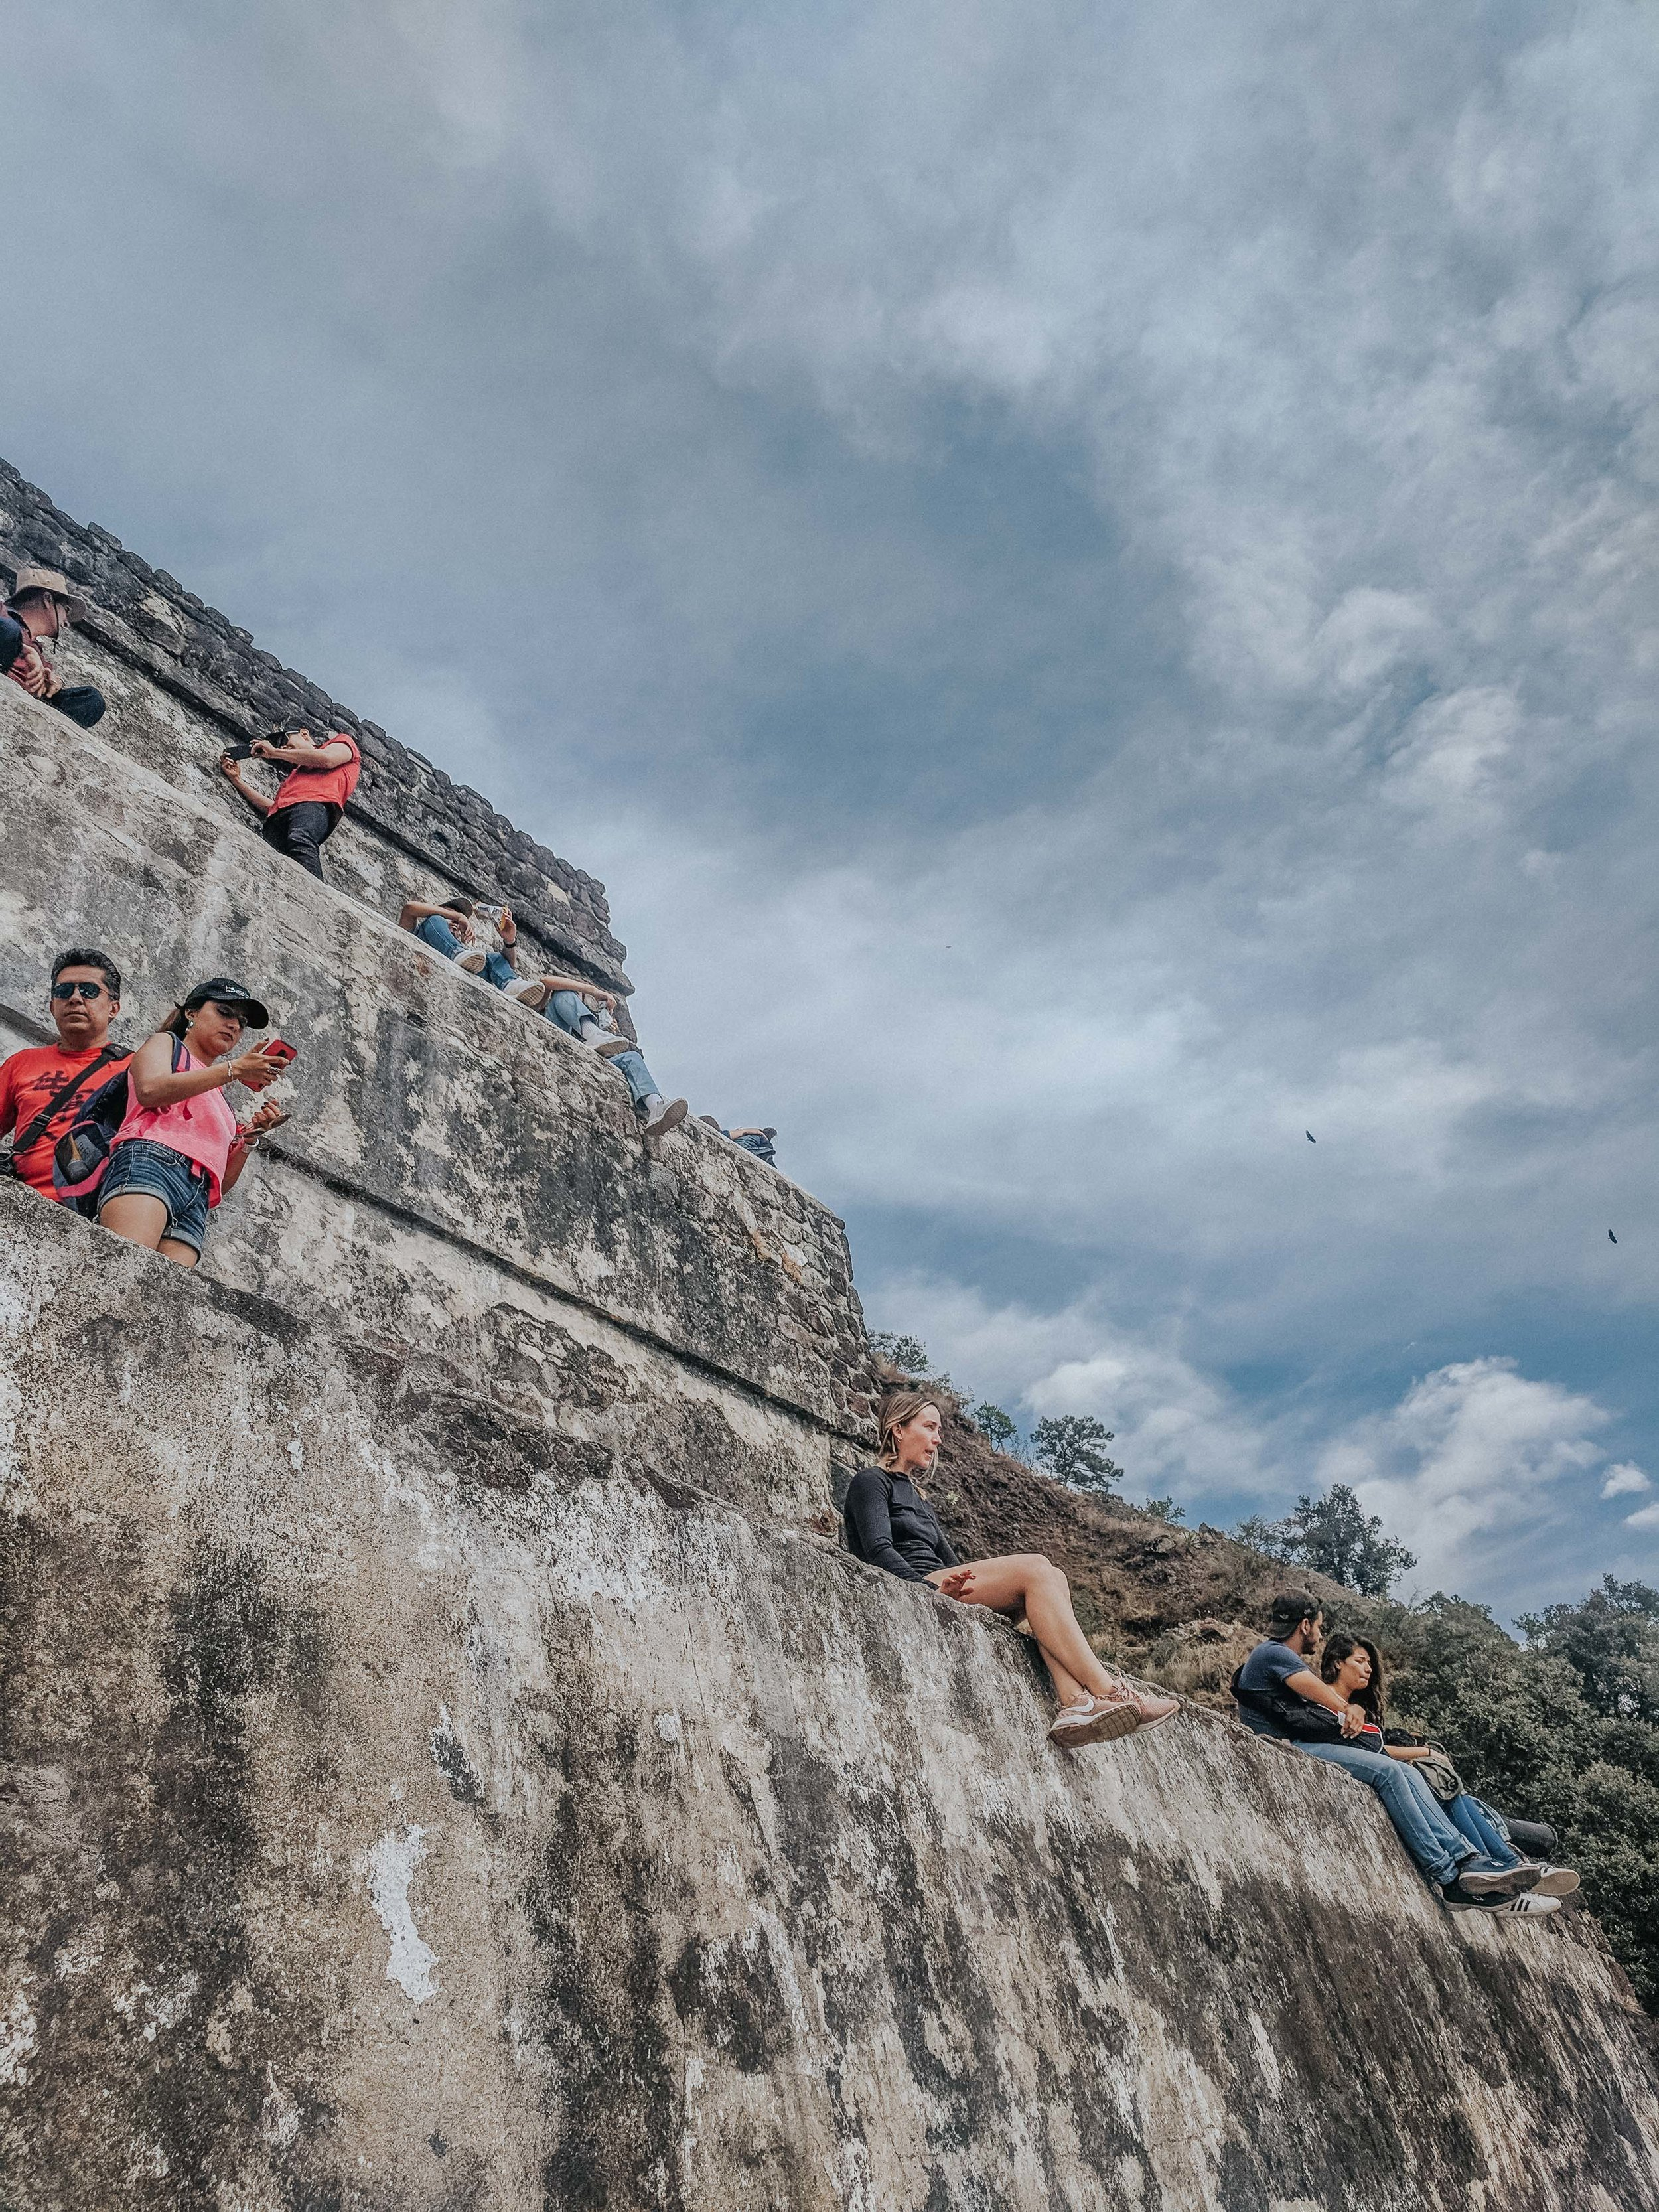 Atop the pyramid in Tepoztlan.